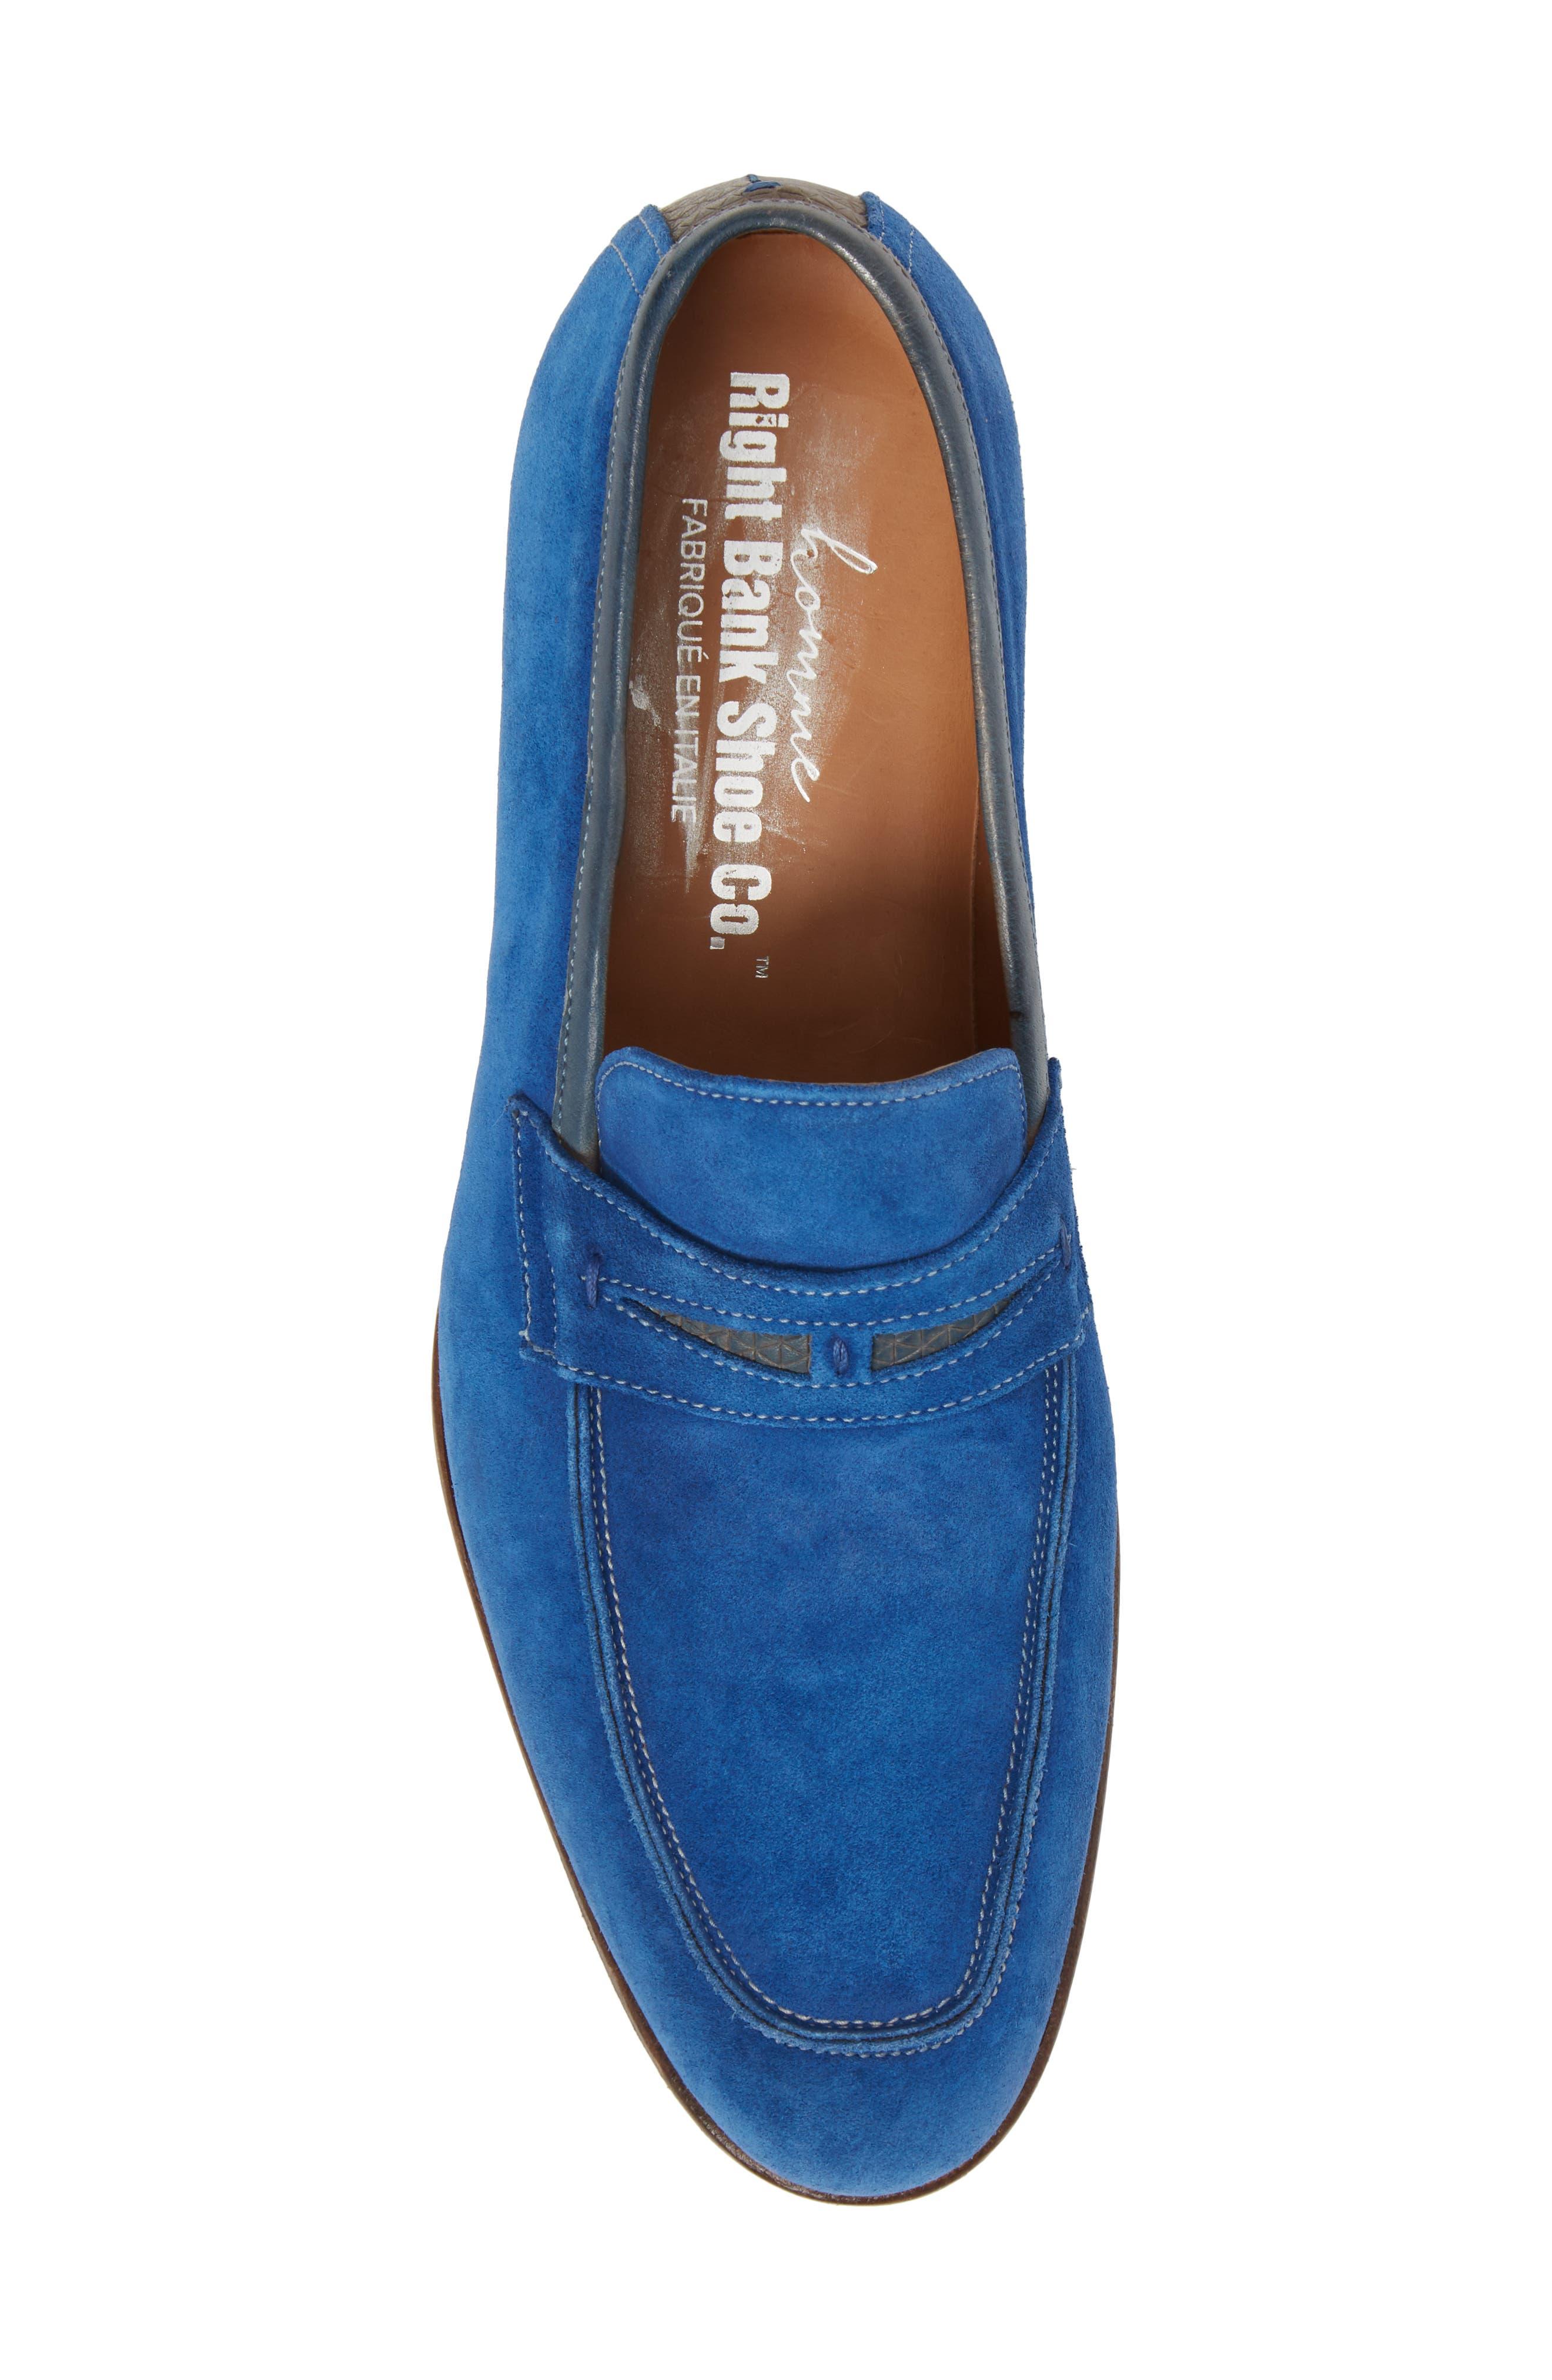 Lex Apron Toe Penny Loafer,                             Alternate thumbnail 5, color,                             Blue Suede